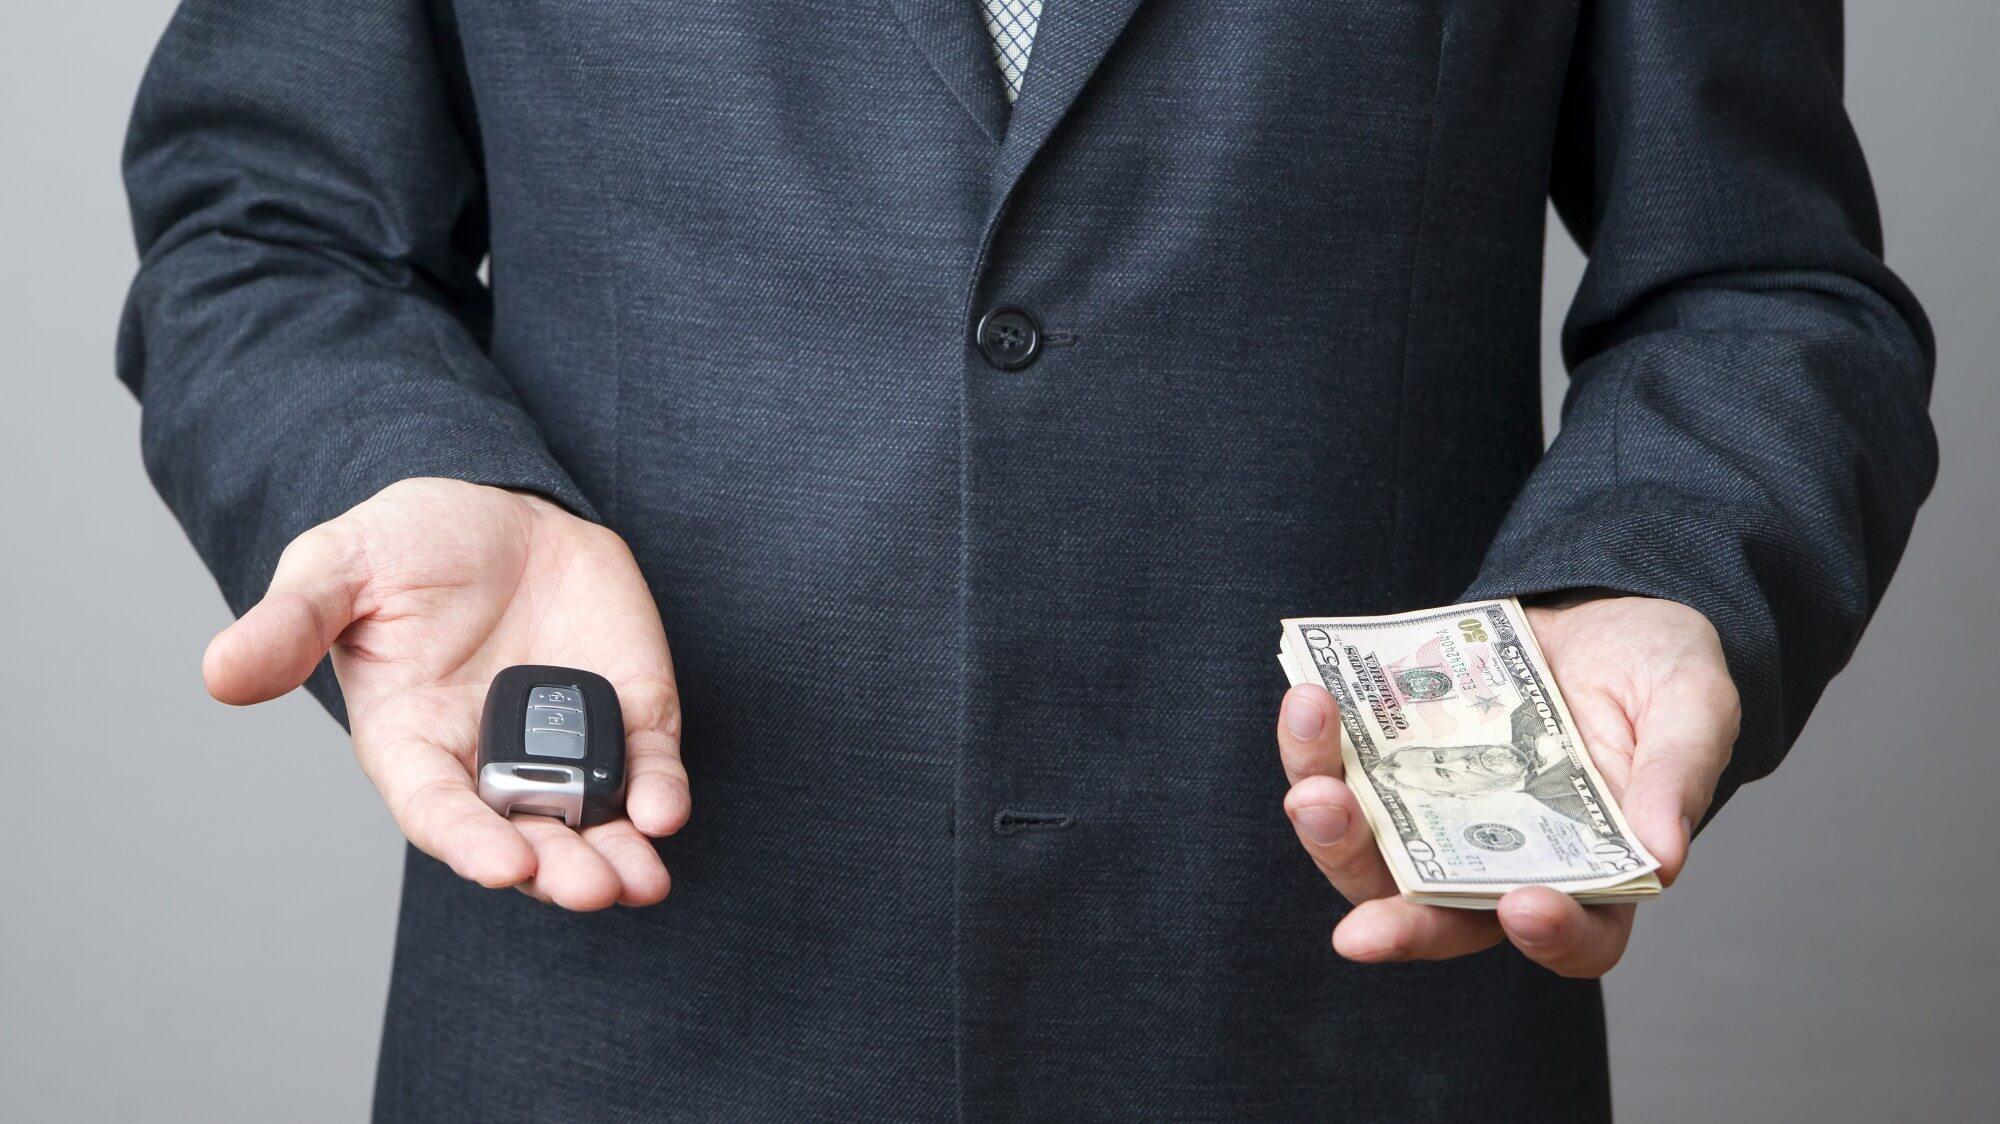 Что влияет на сумму кредита под залог имущества?